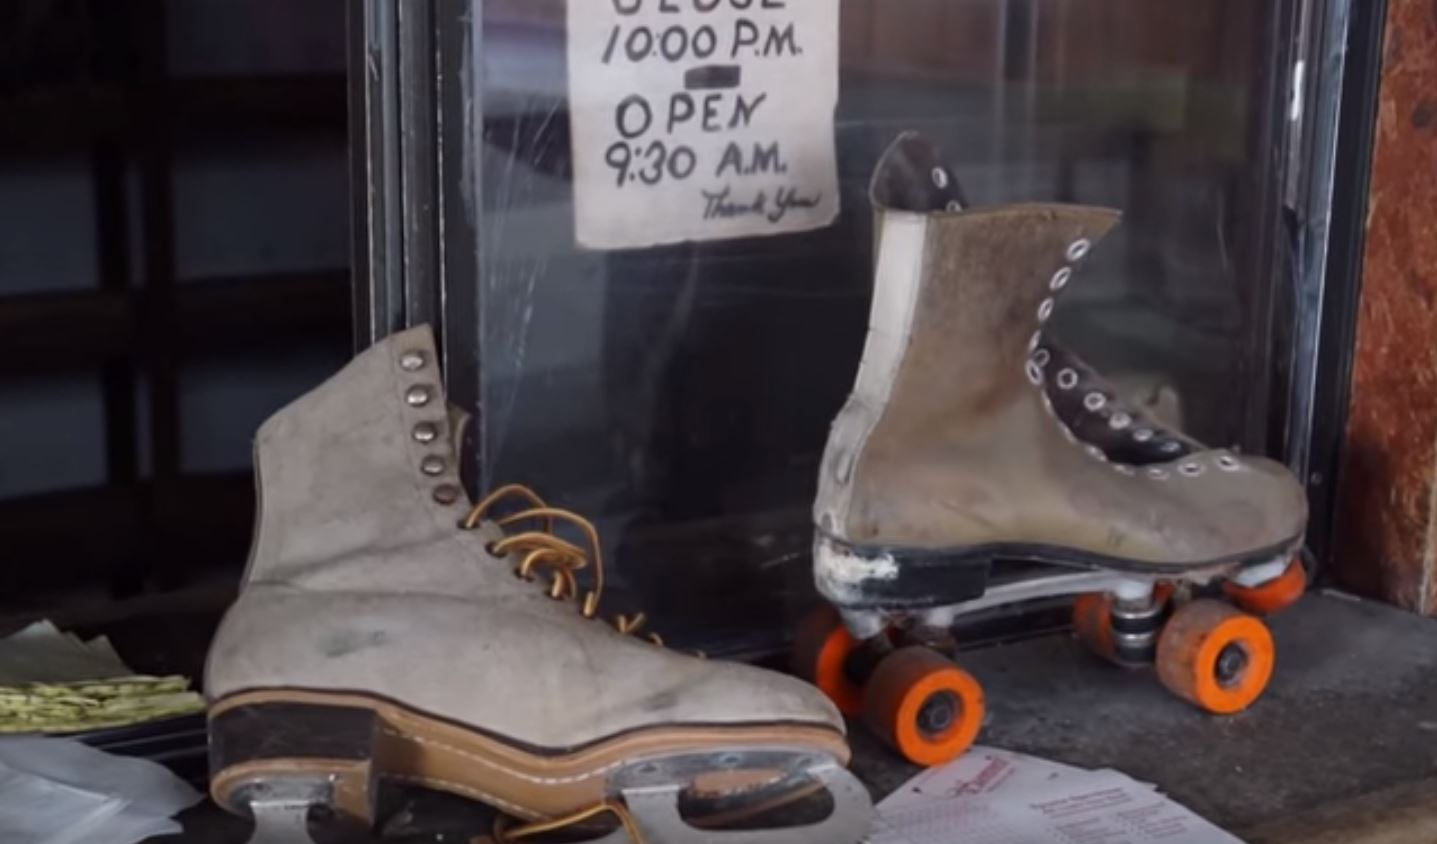 Dan Bell Poconos Skates